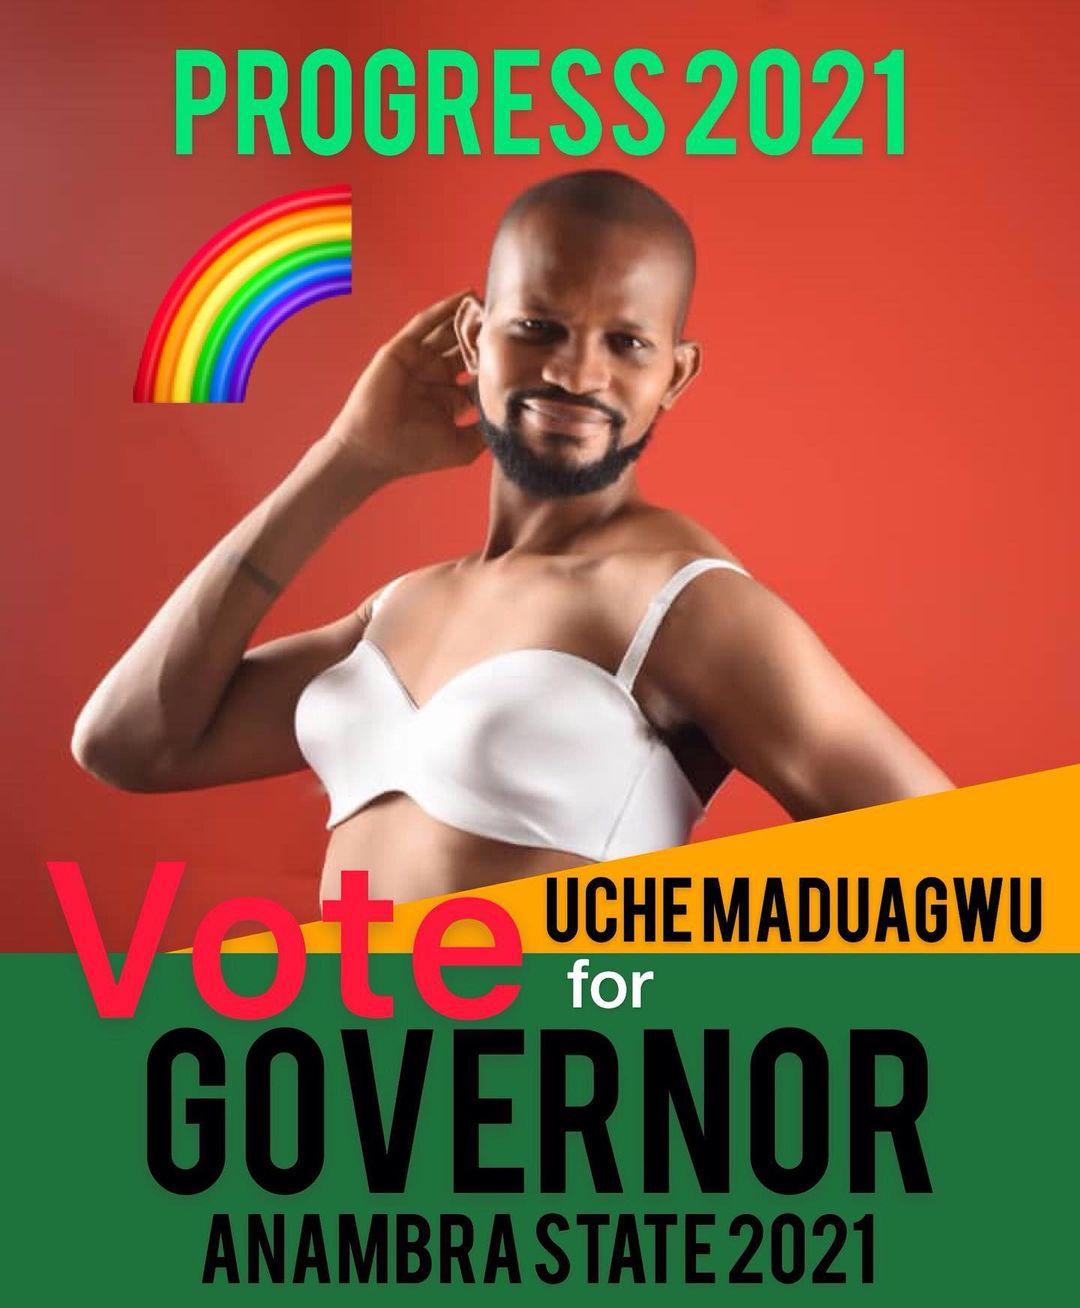 Uche Maduagwu for Governor